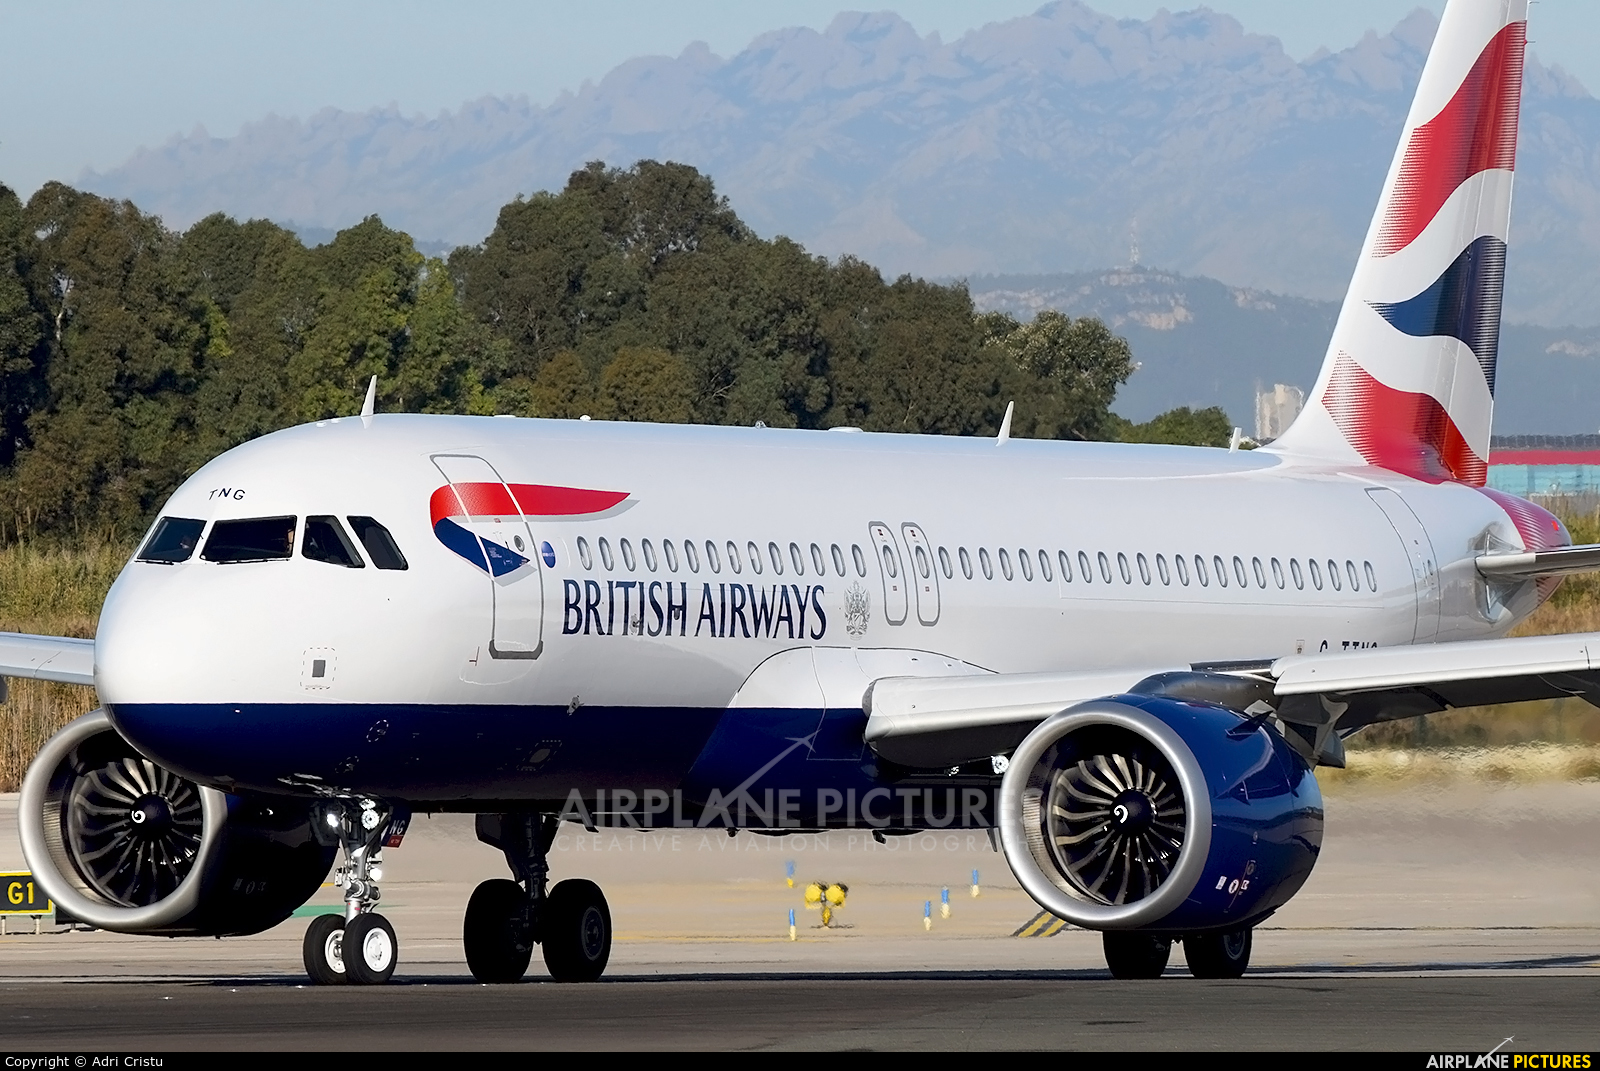 British Airways G-TTNG aircraft at Barcelona - El Prat